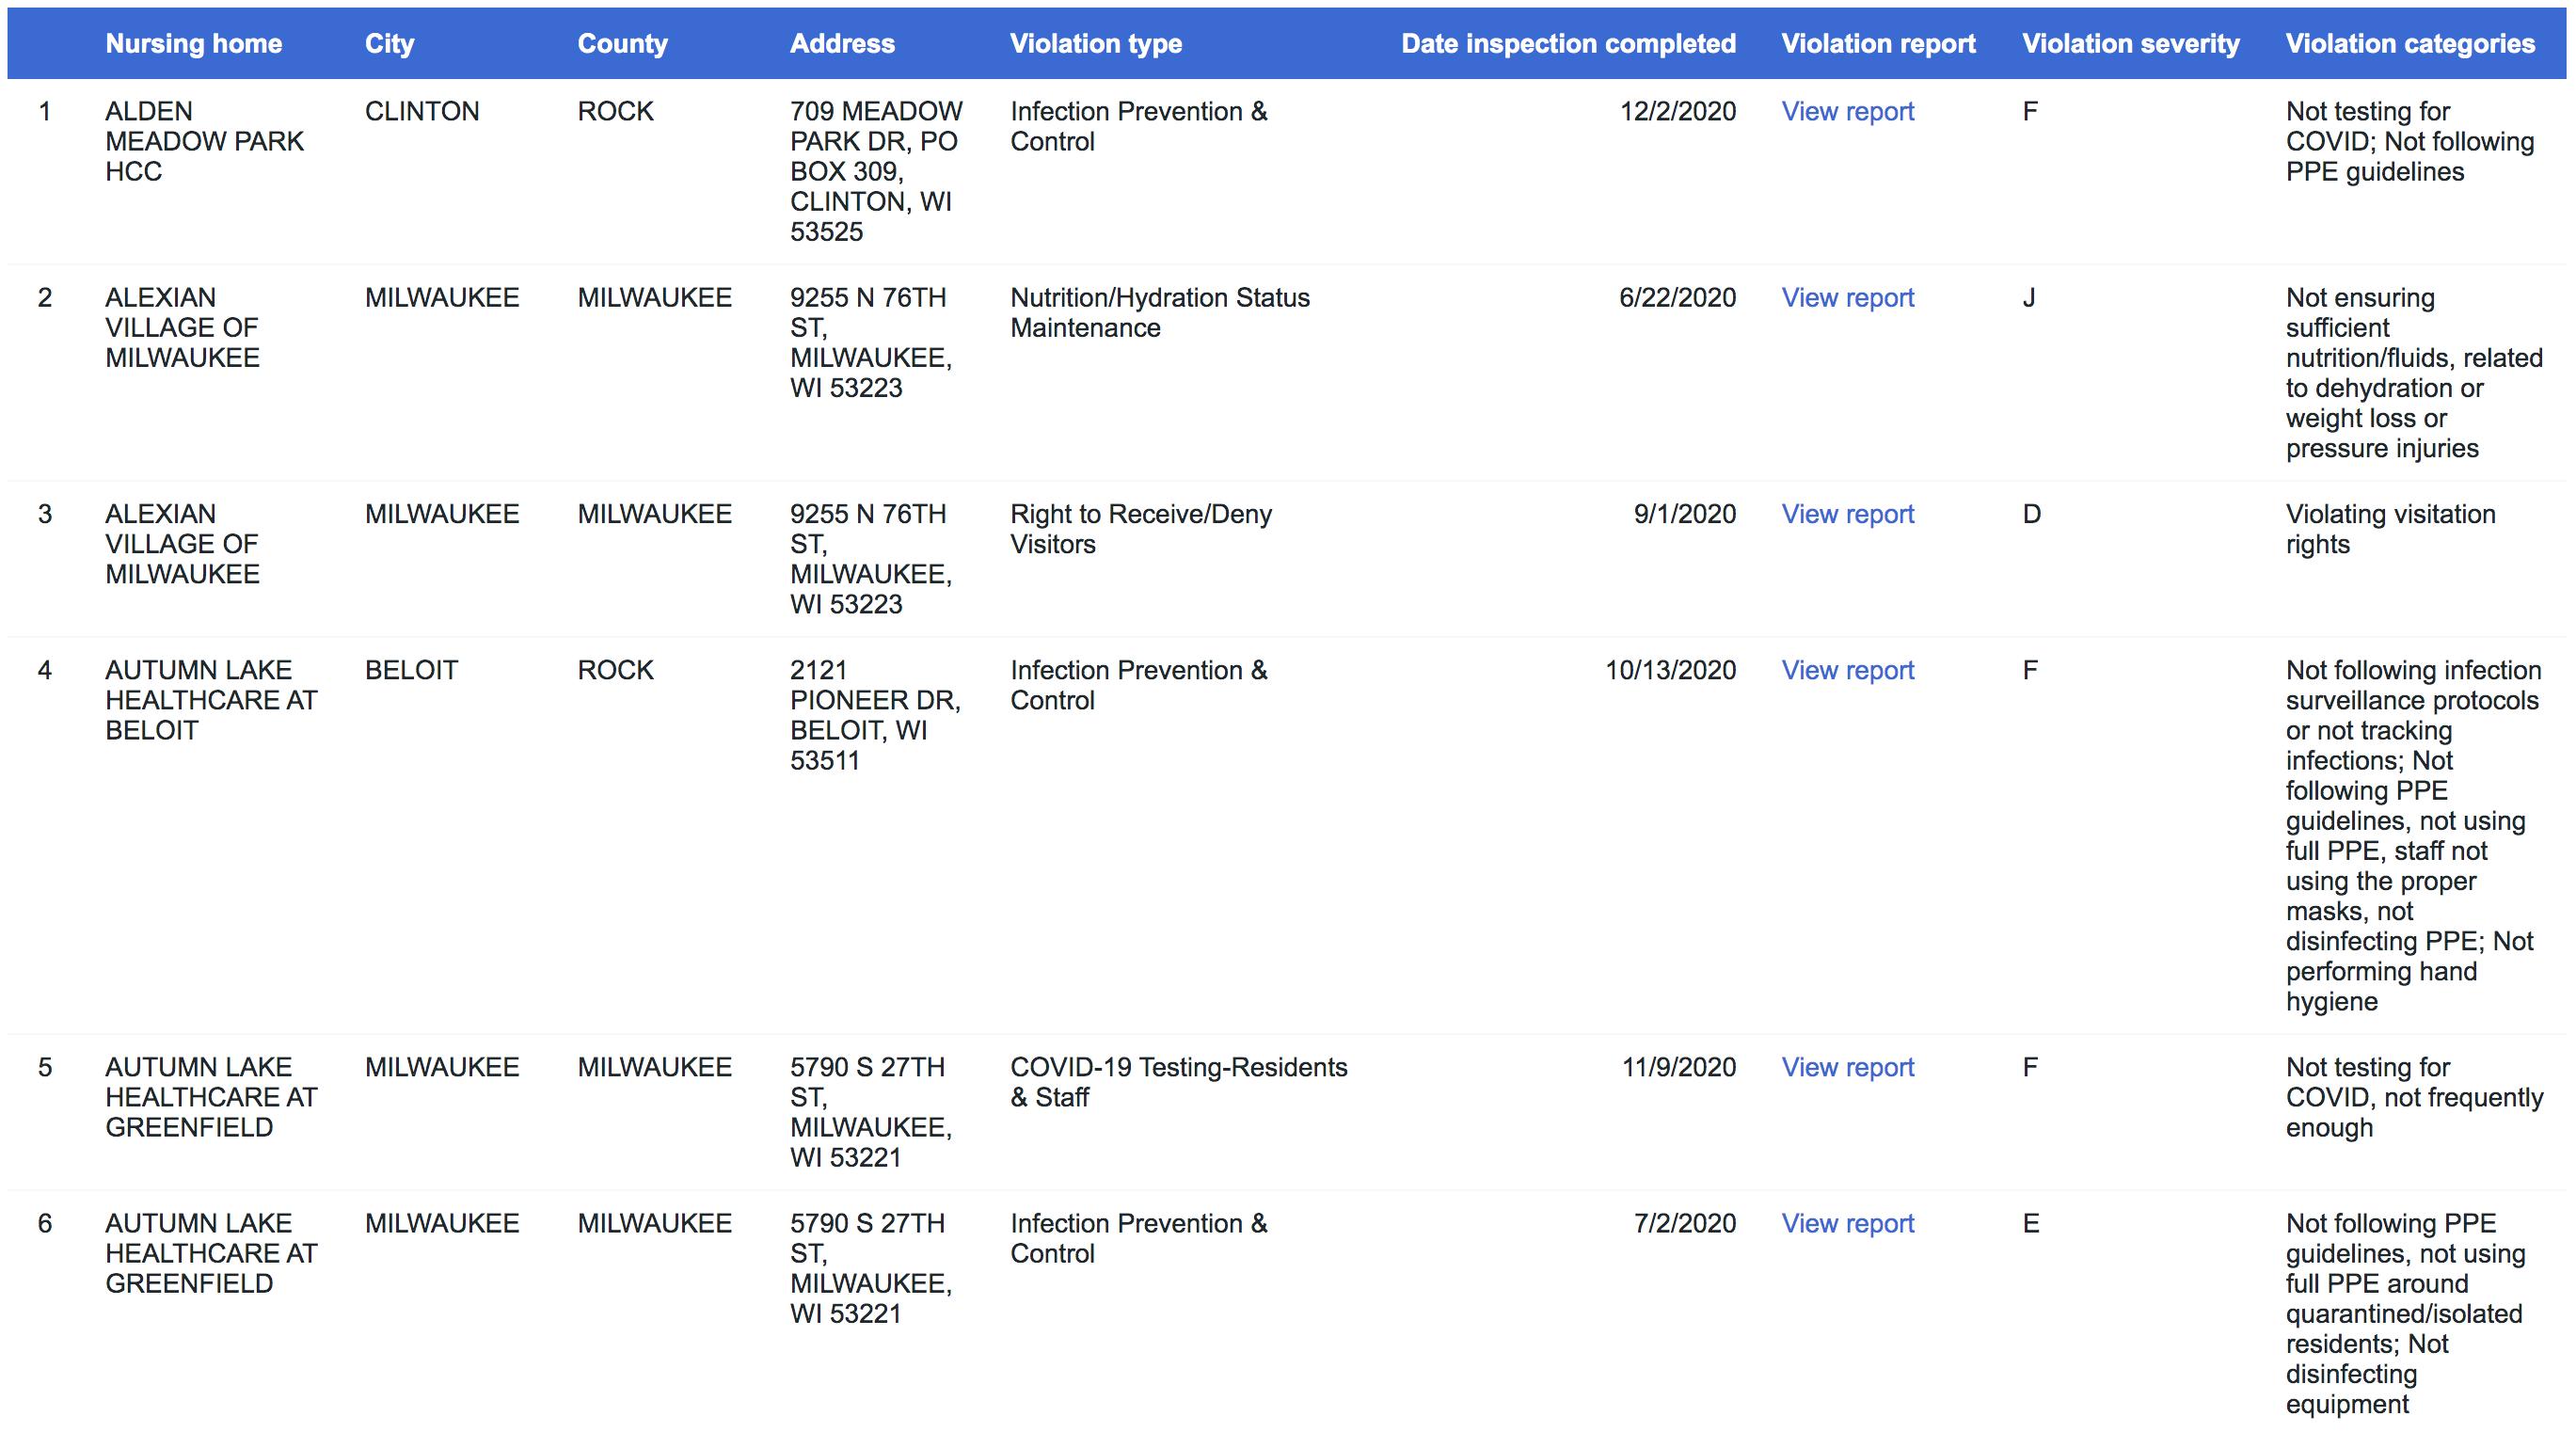 Screenshot of searchable database